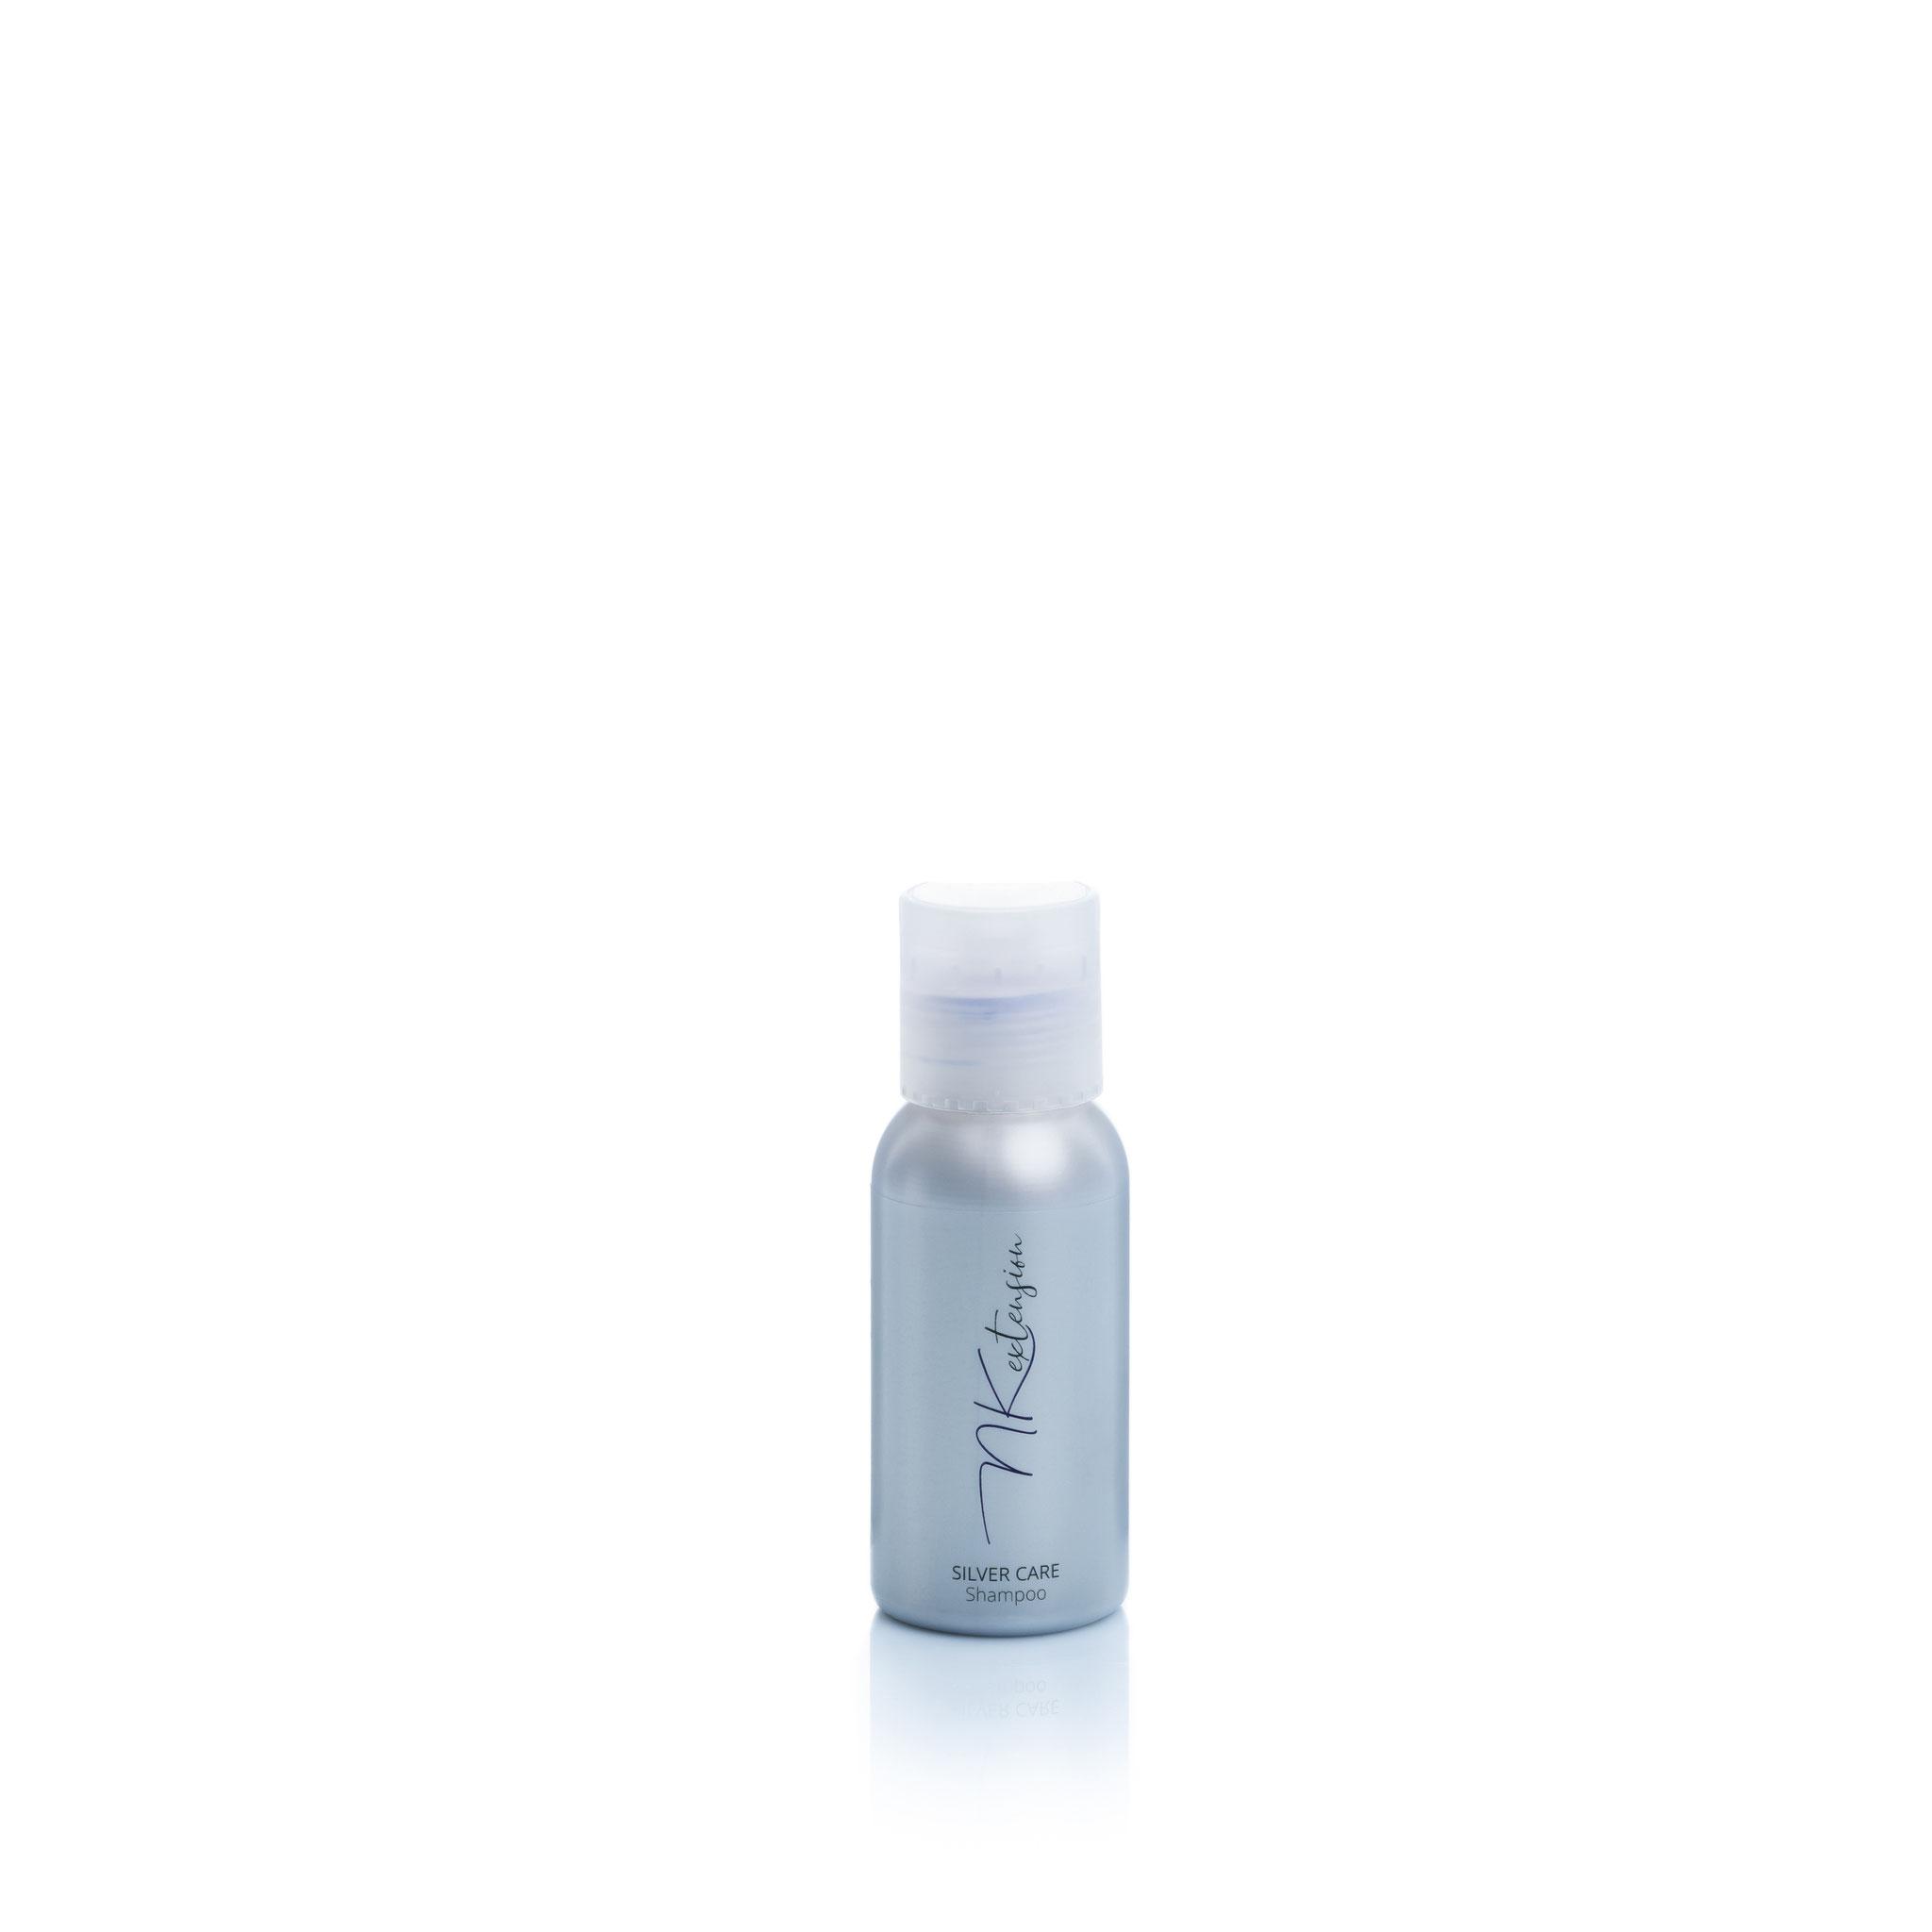 Silver Care Shampoo 50ml